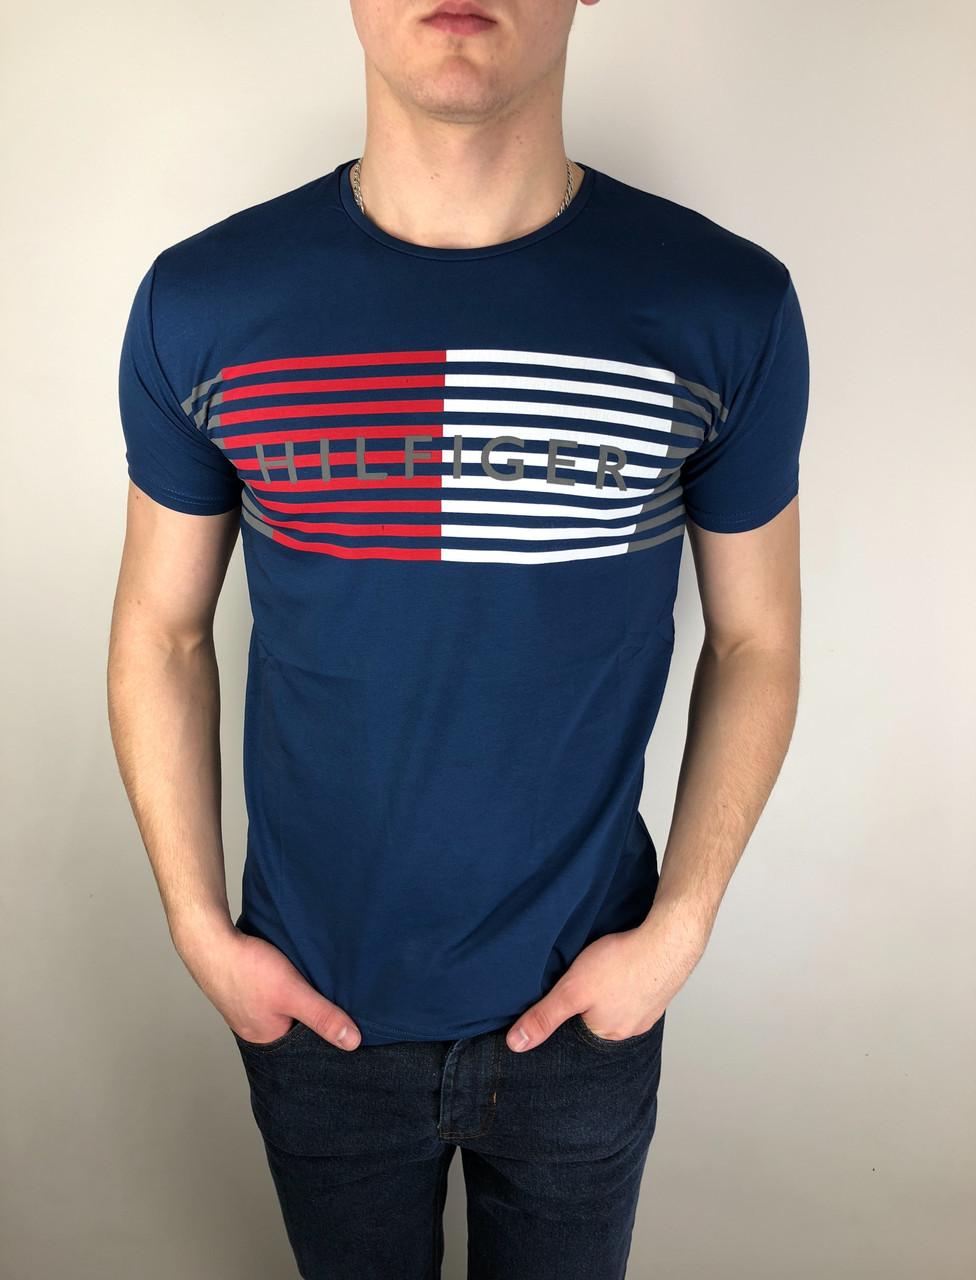 Мужская футболка Tommy Hilfiger качественная копия Темно-синий